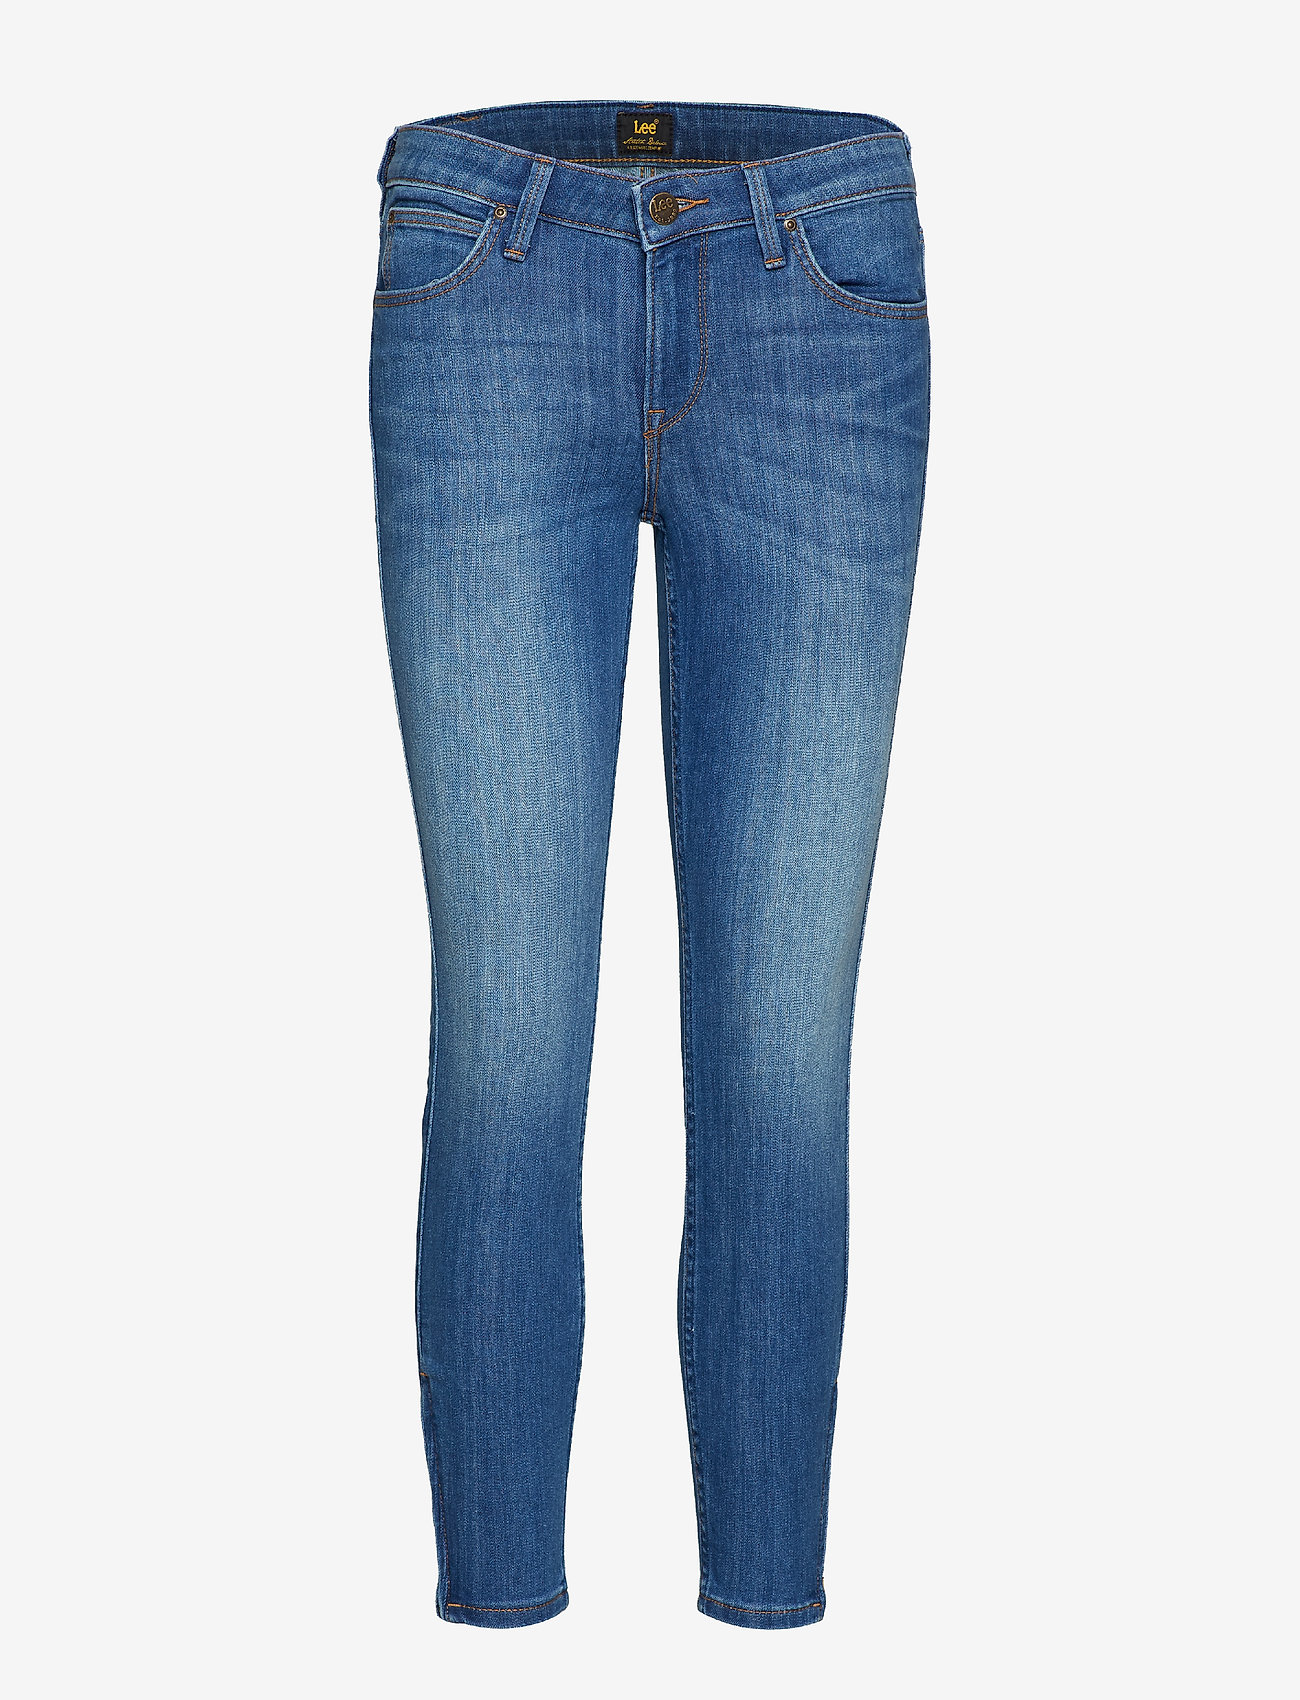 Lee Jeans - SCARLETT CROPPED - slim jeans - high blue - 1